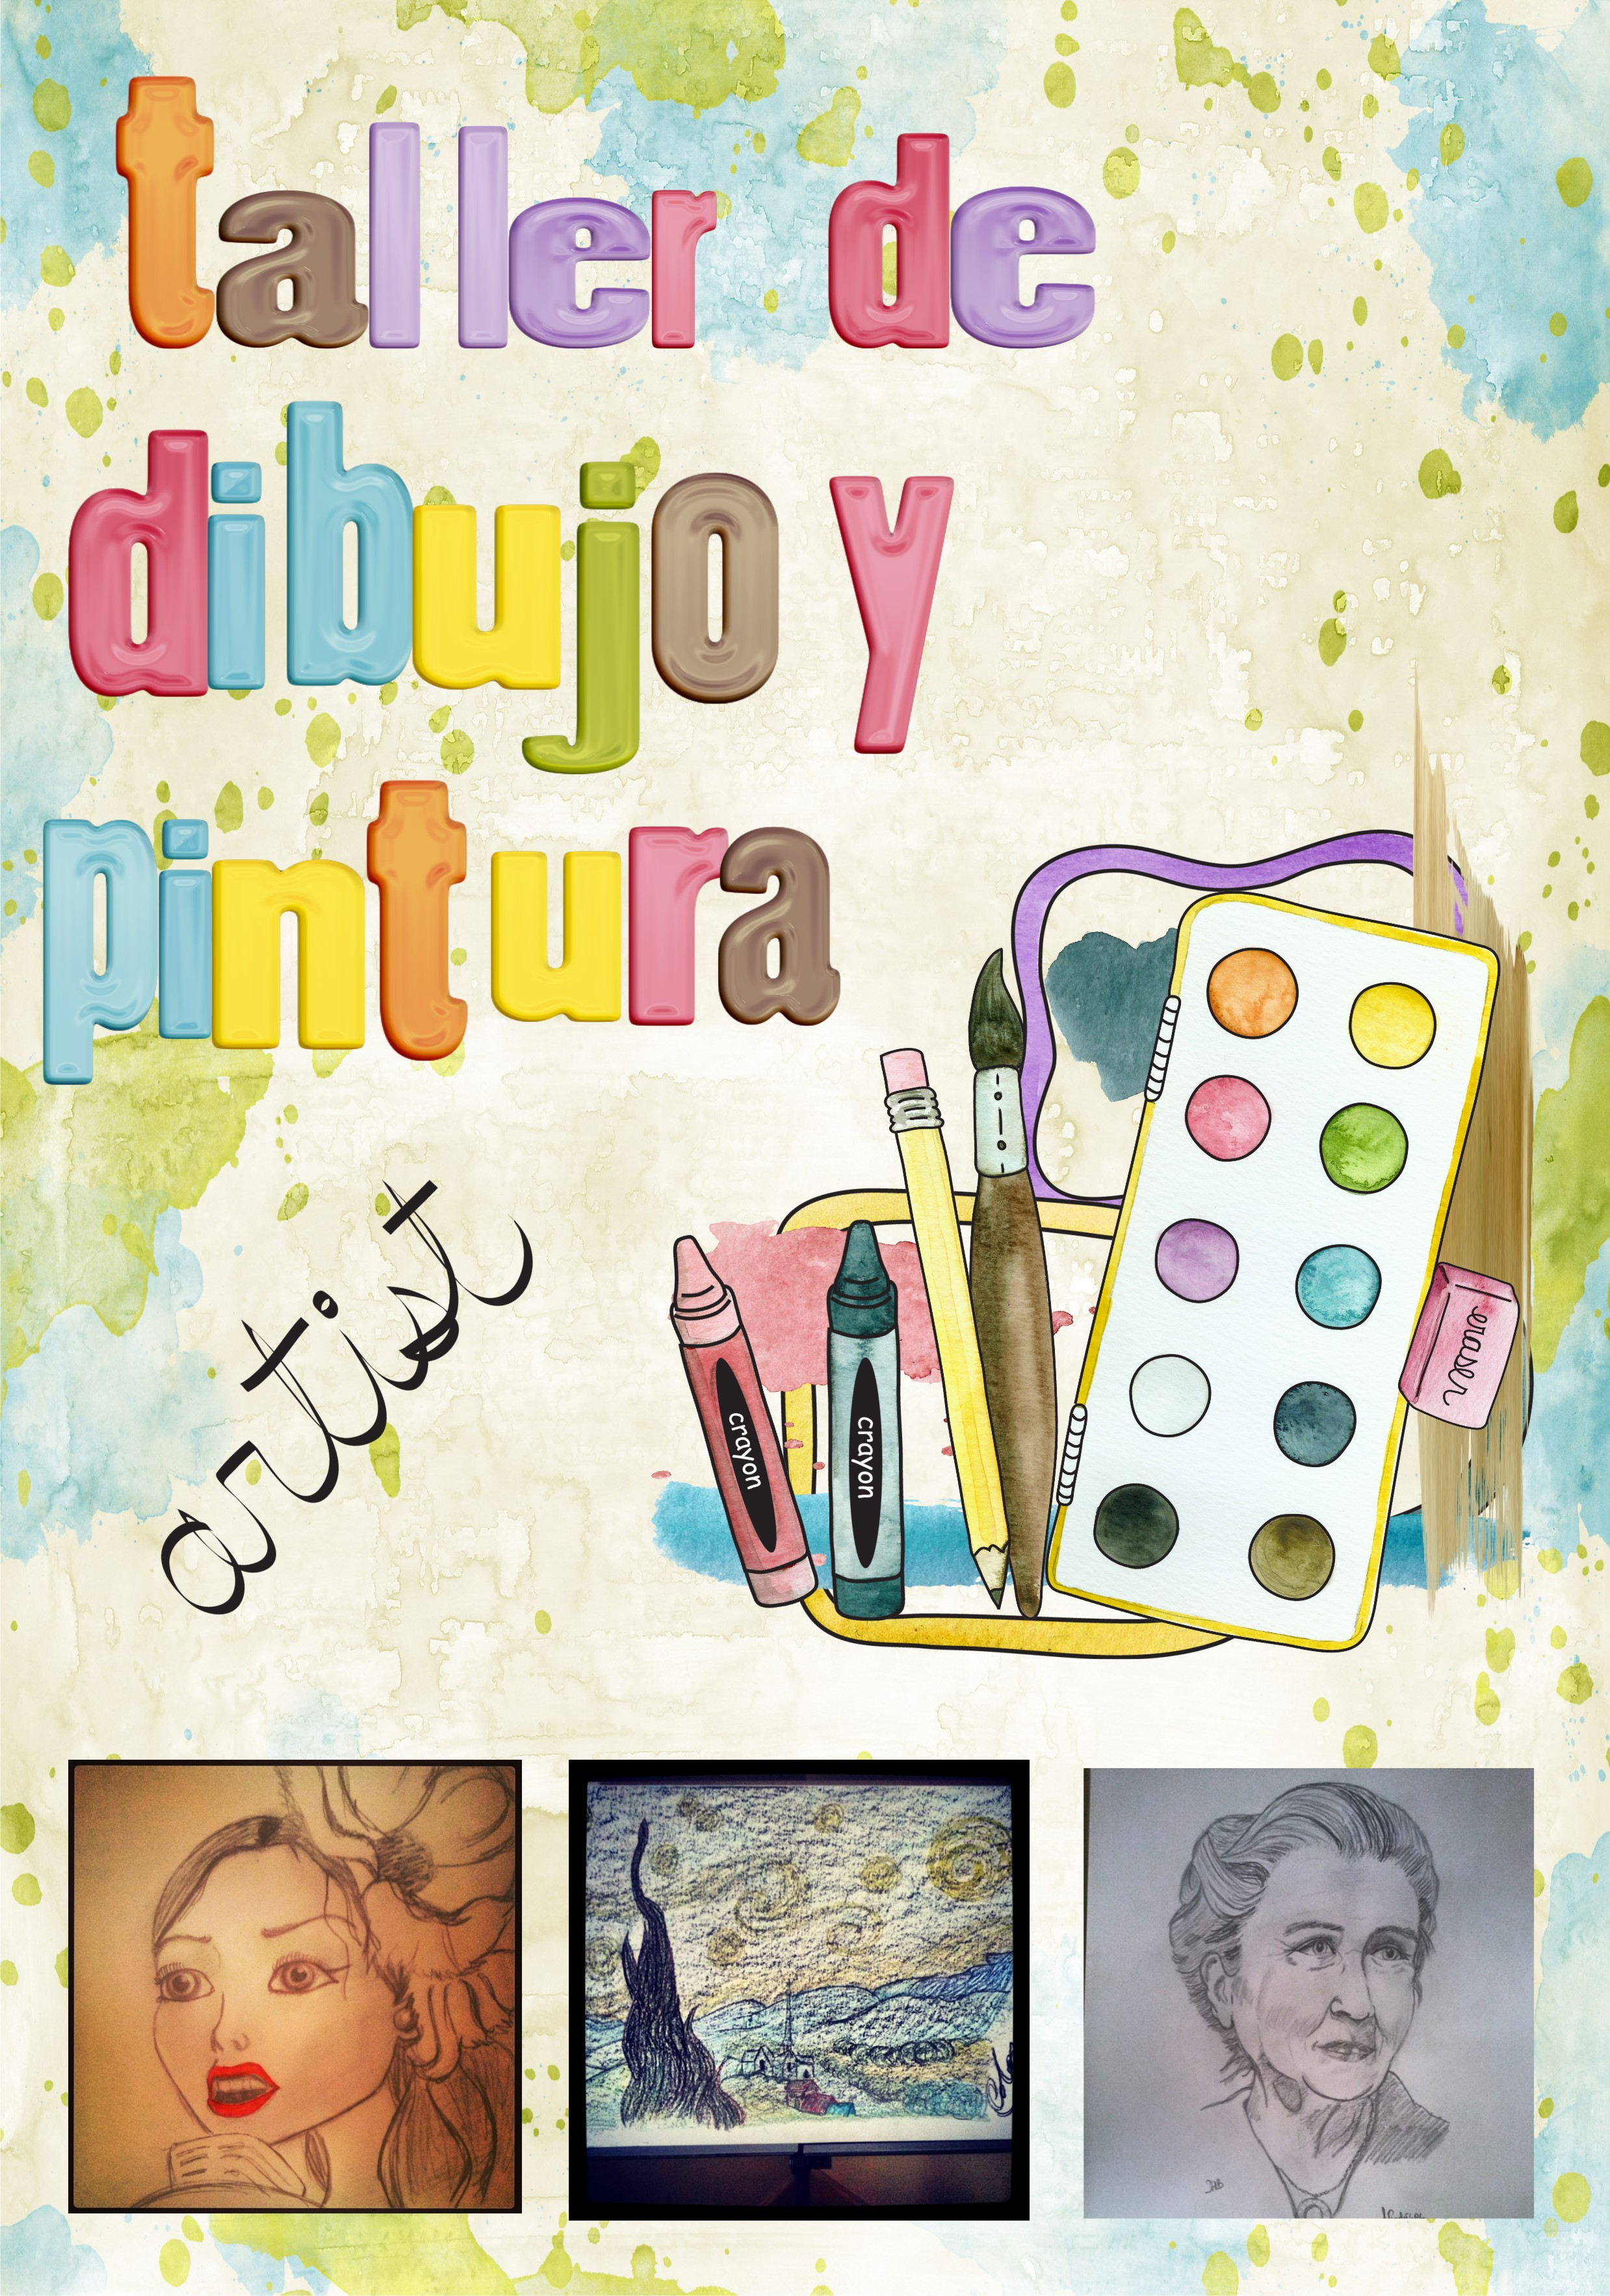 Taller dibujo y pintura cartel1 - Pintura infantil pared ...